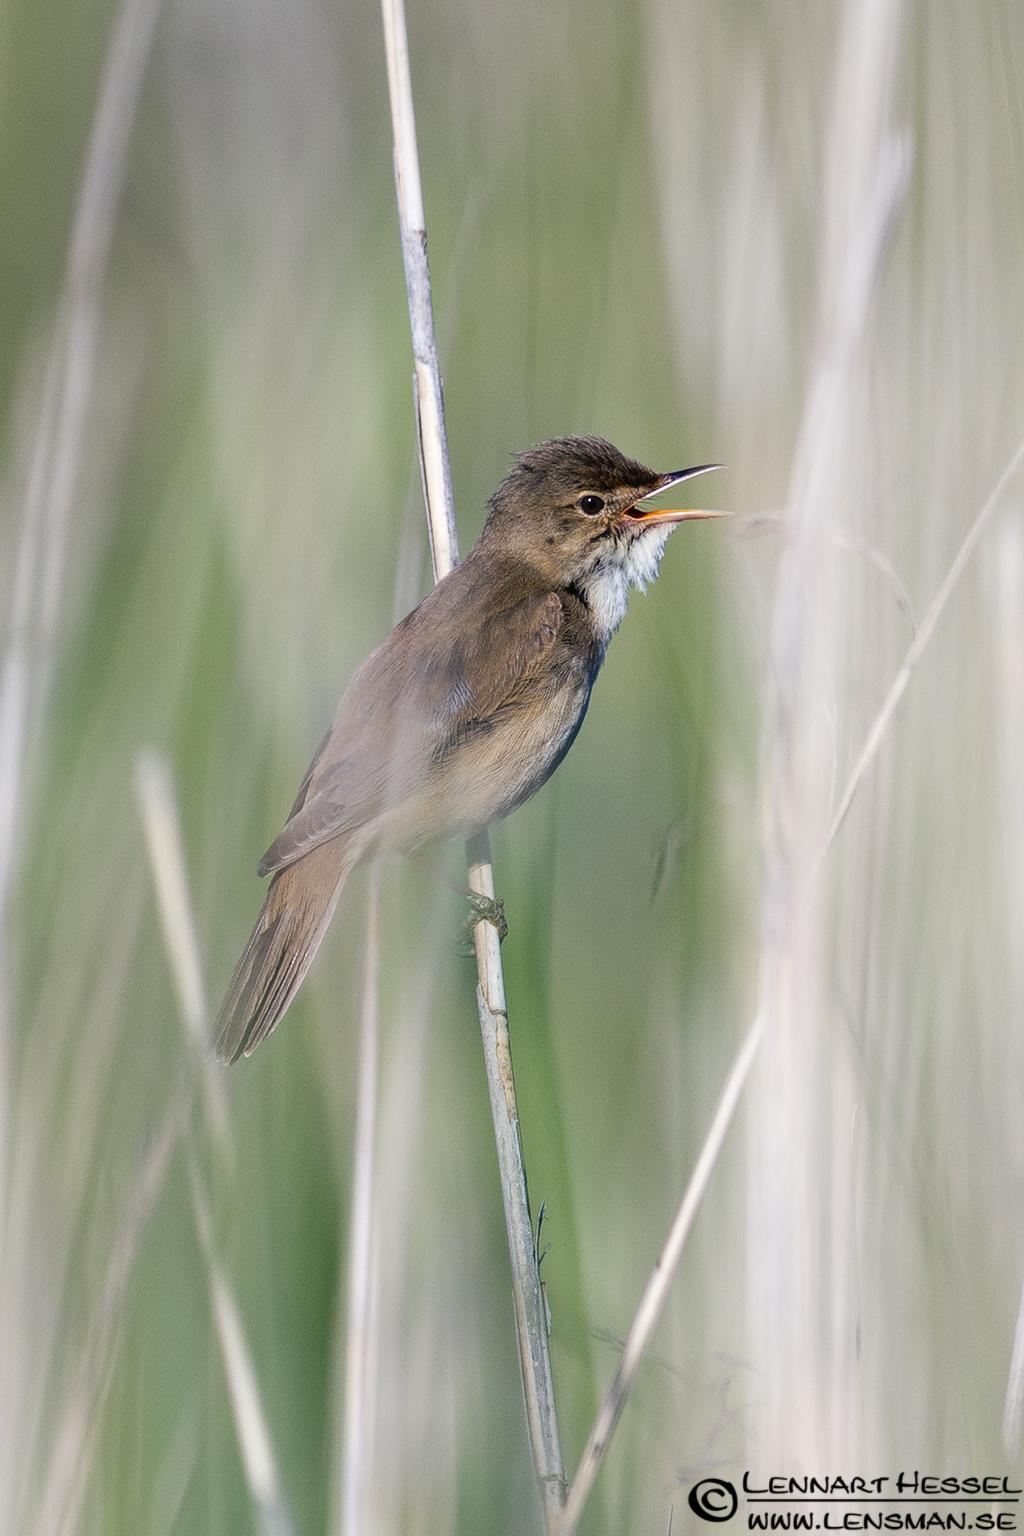 Eurasian Reed Warbler at Säveån, reed bunting